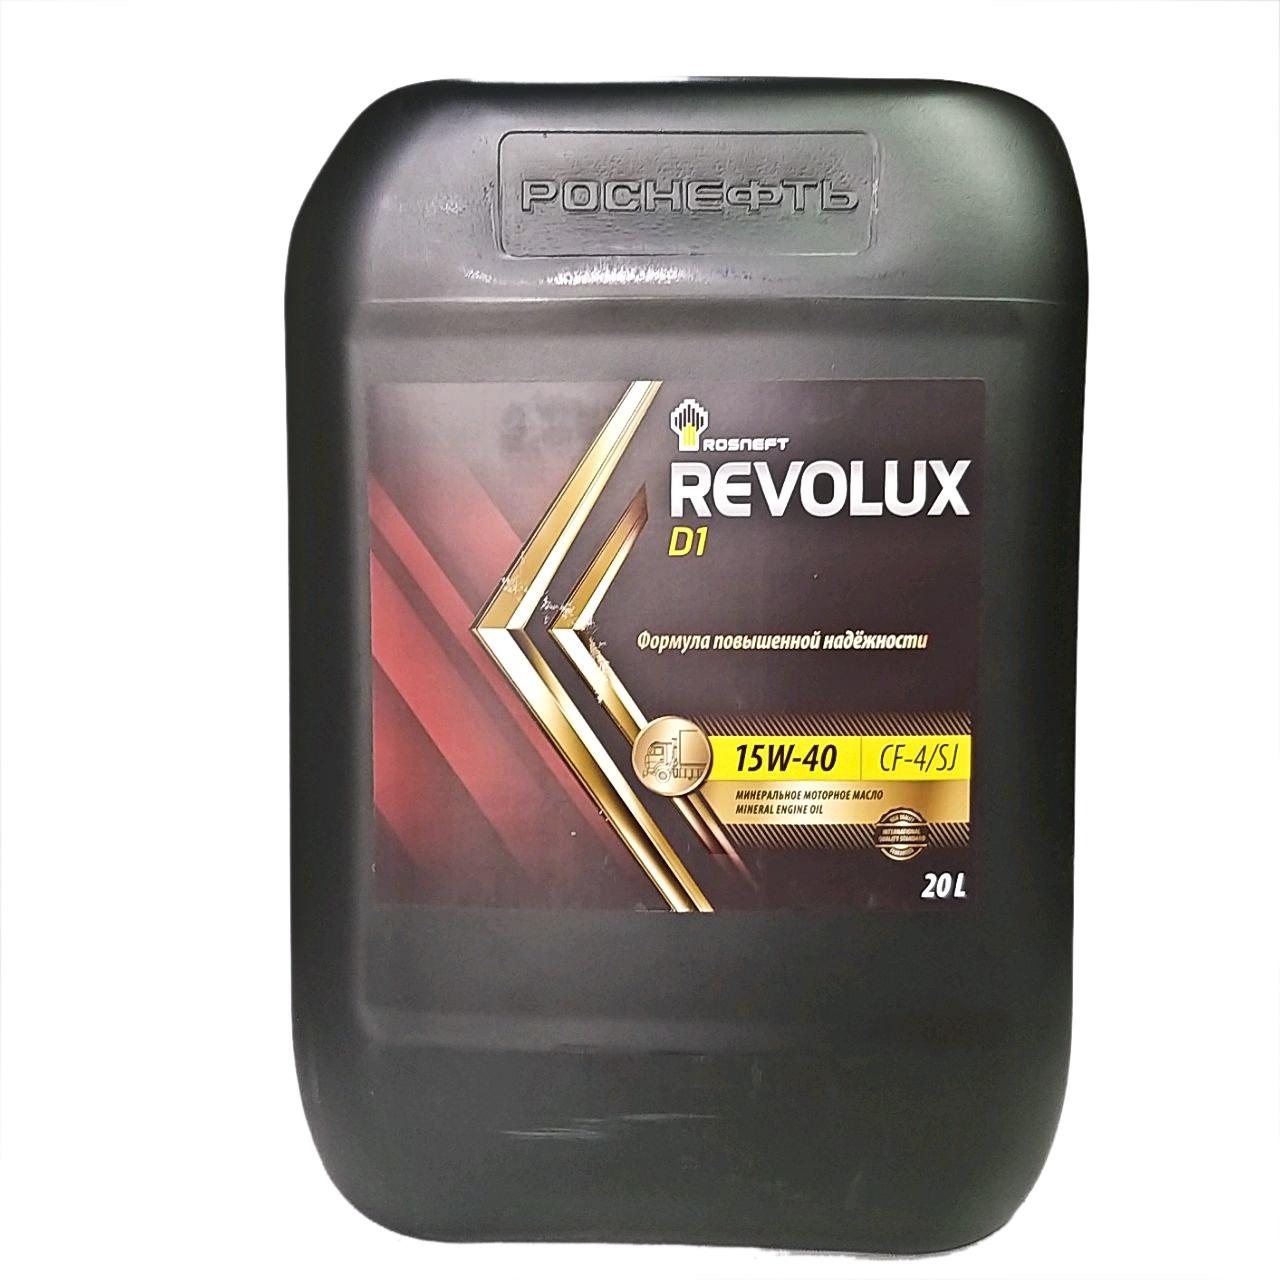 Rosneft Revolux D1 15w-40 (20 L.)